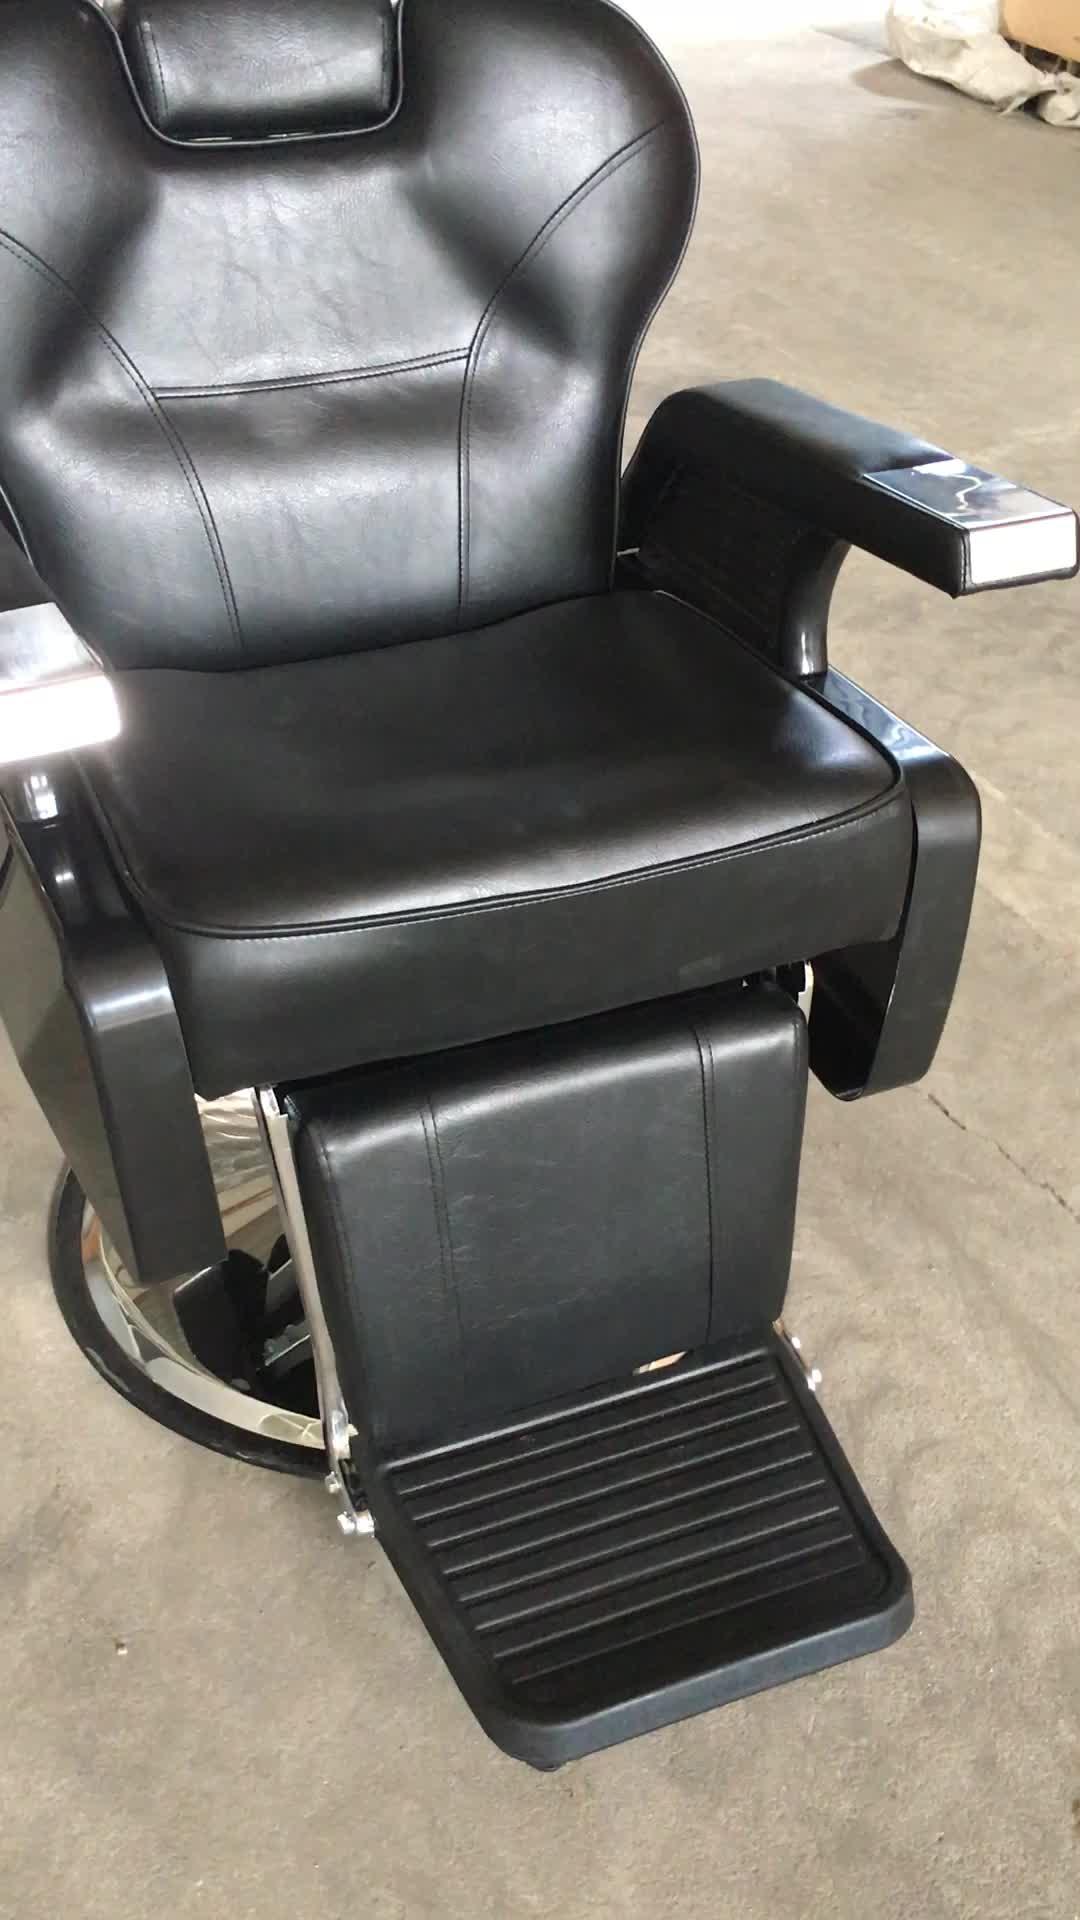 wholesale salon equipment beauty salon furniture barber shop cheap barberia y peluqueria chair barber